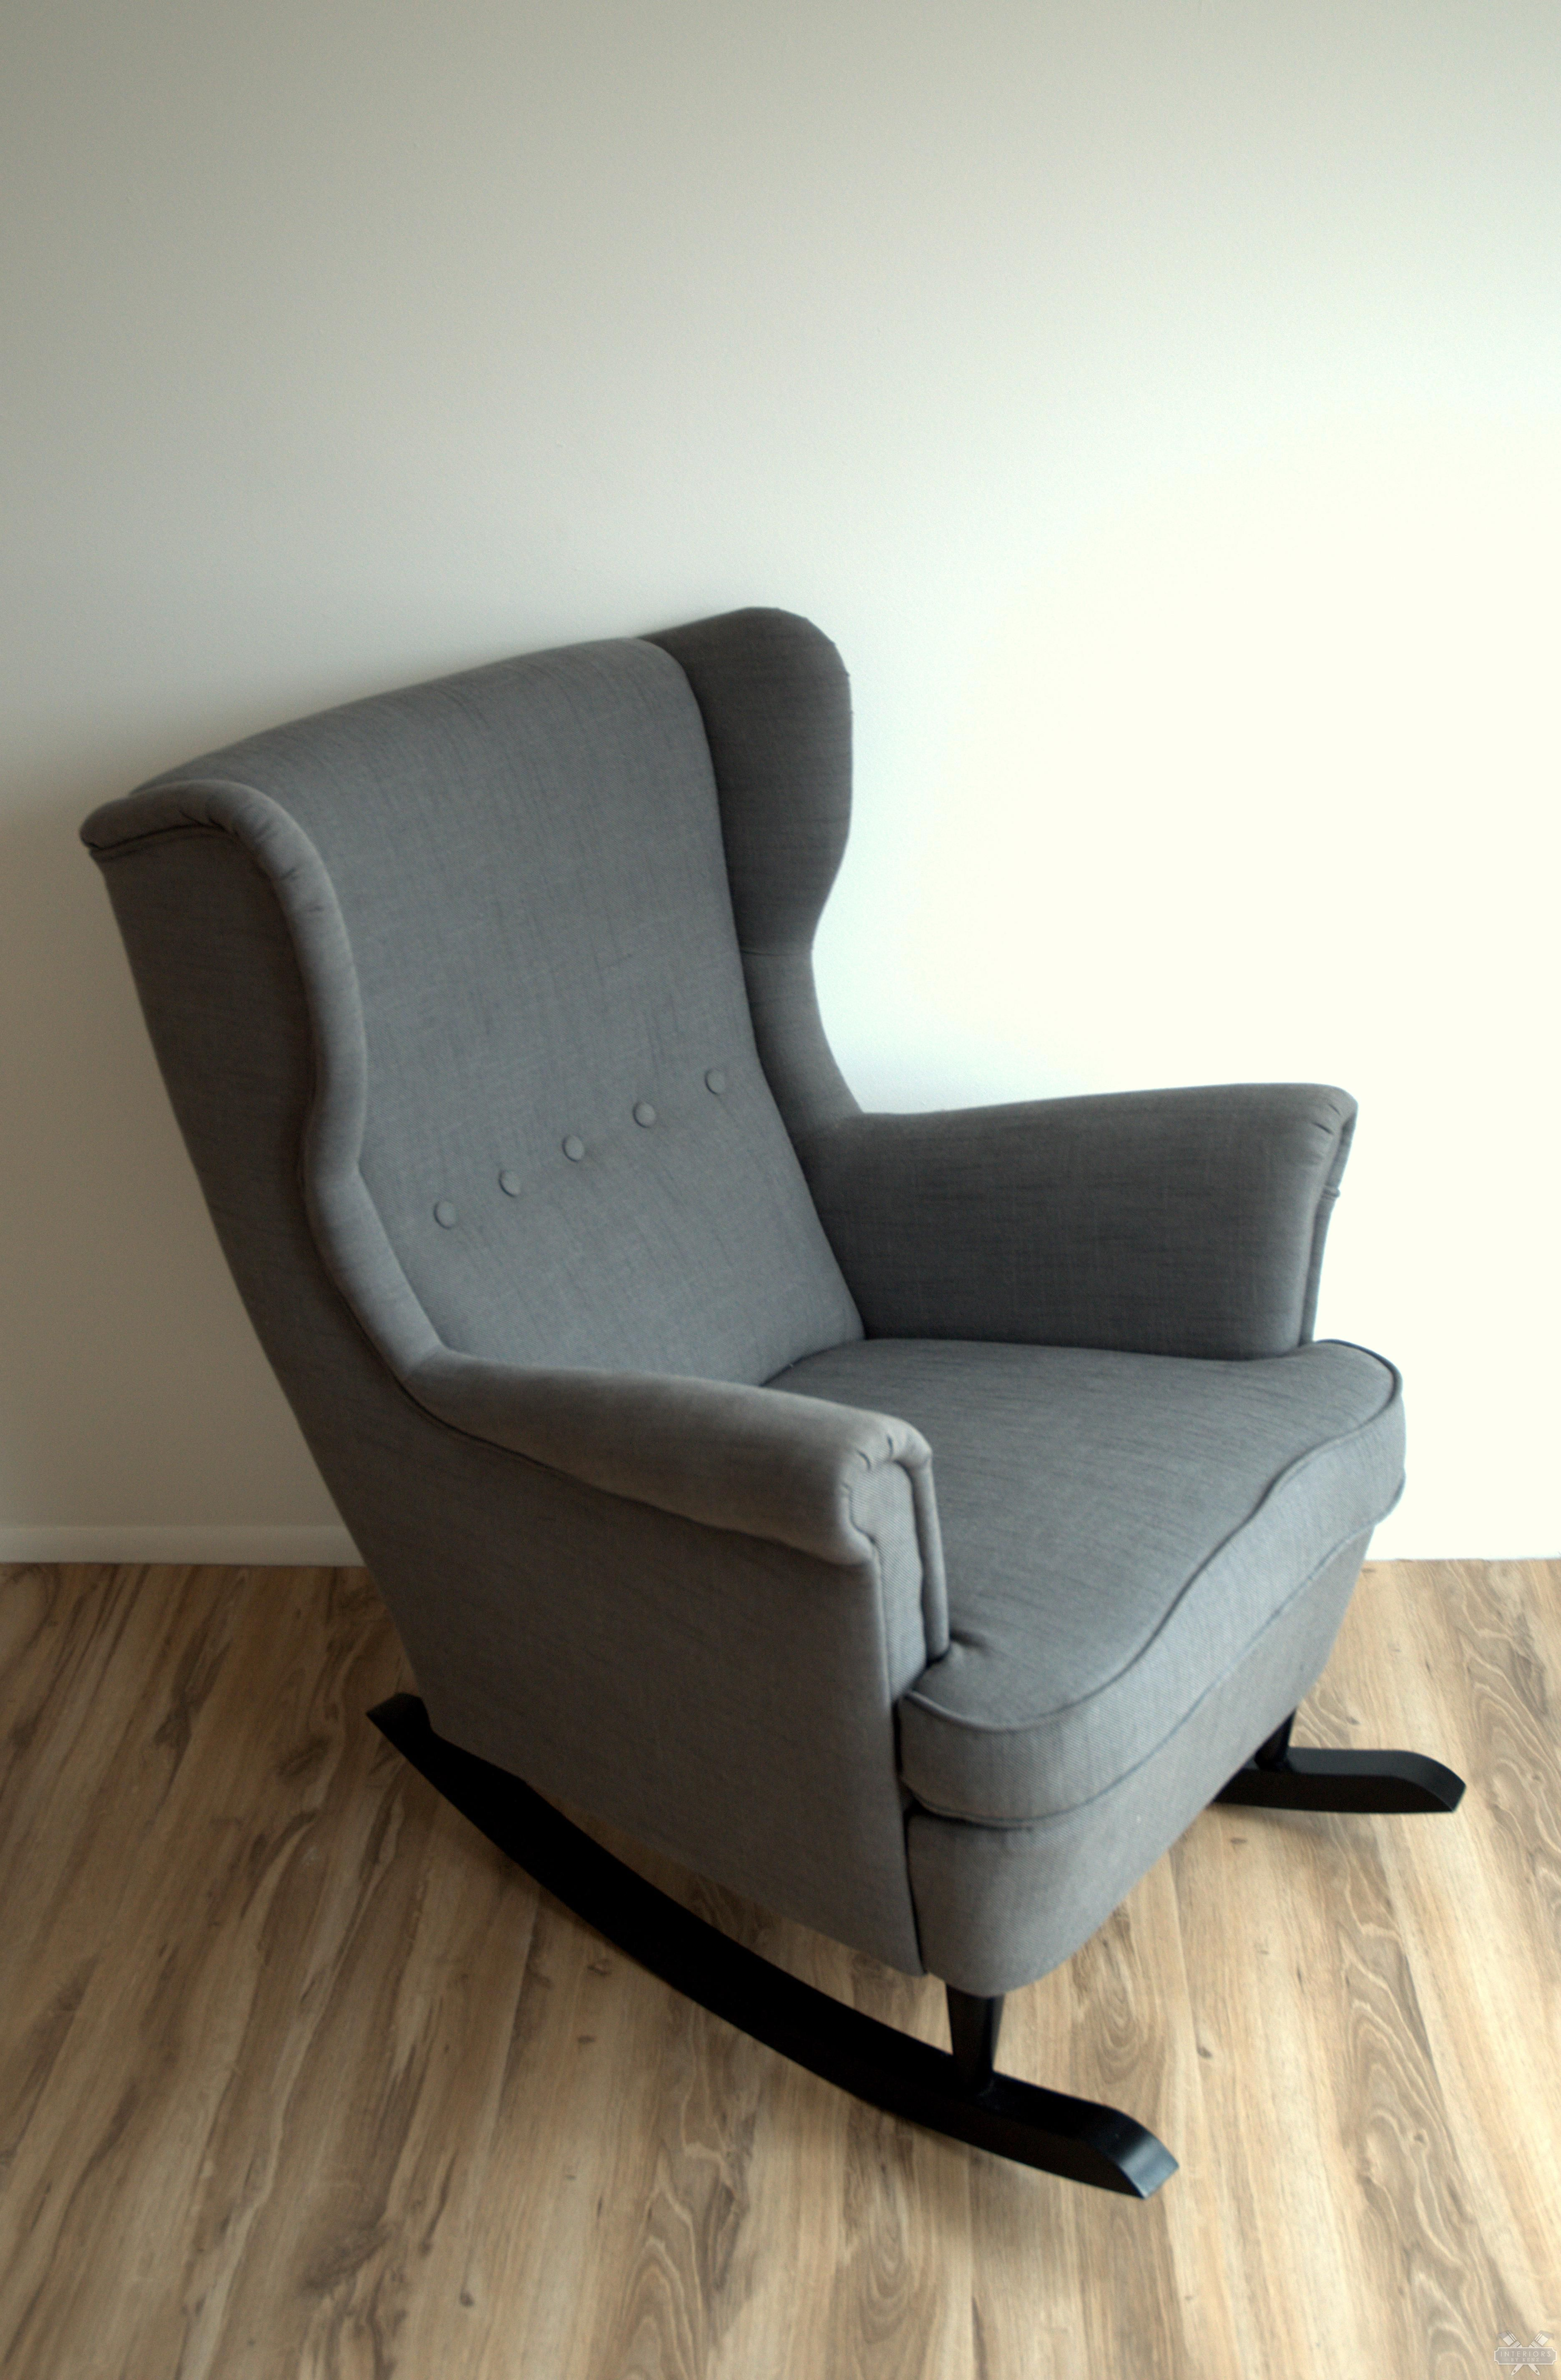 IKEA Hack Strandmon Rocker {DIY Wingback Rocking Chair